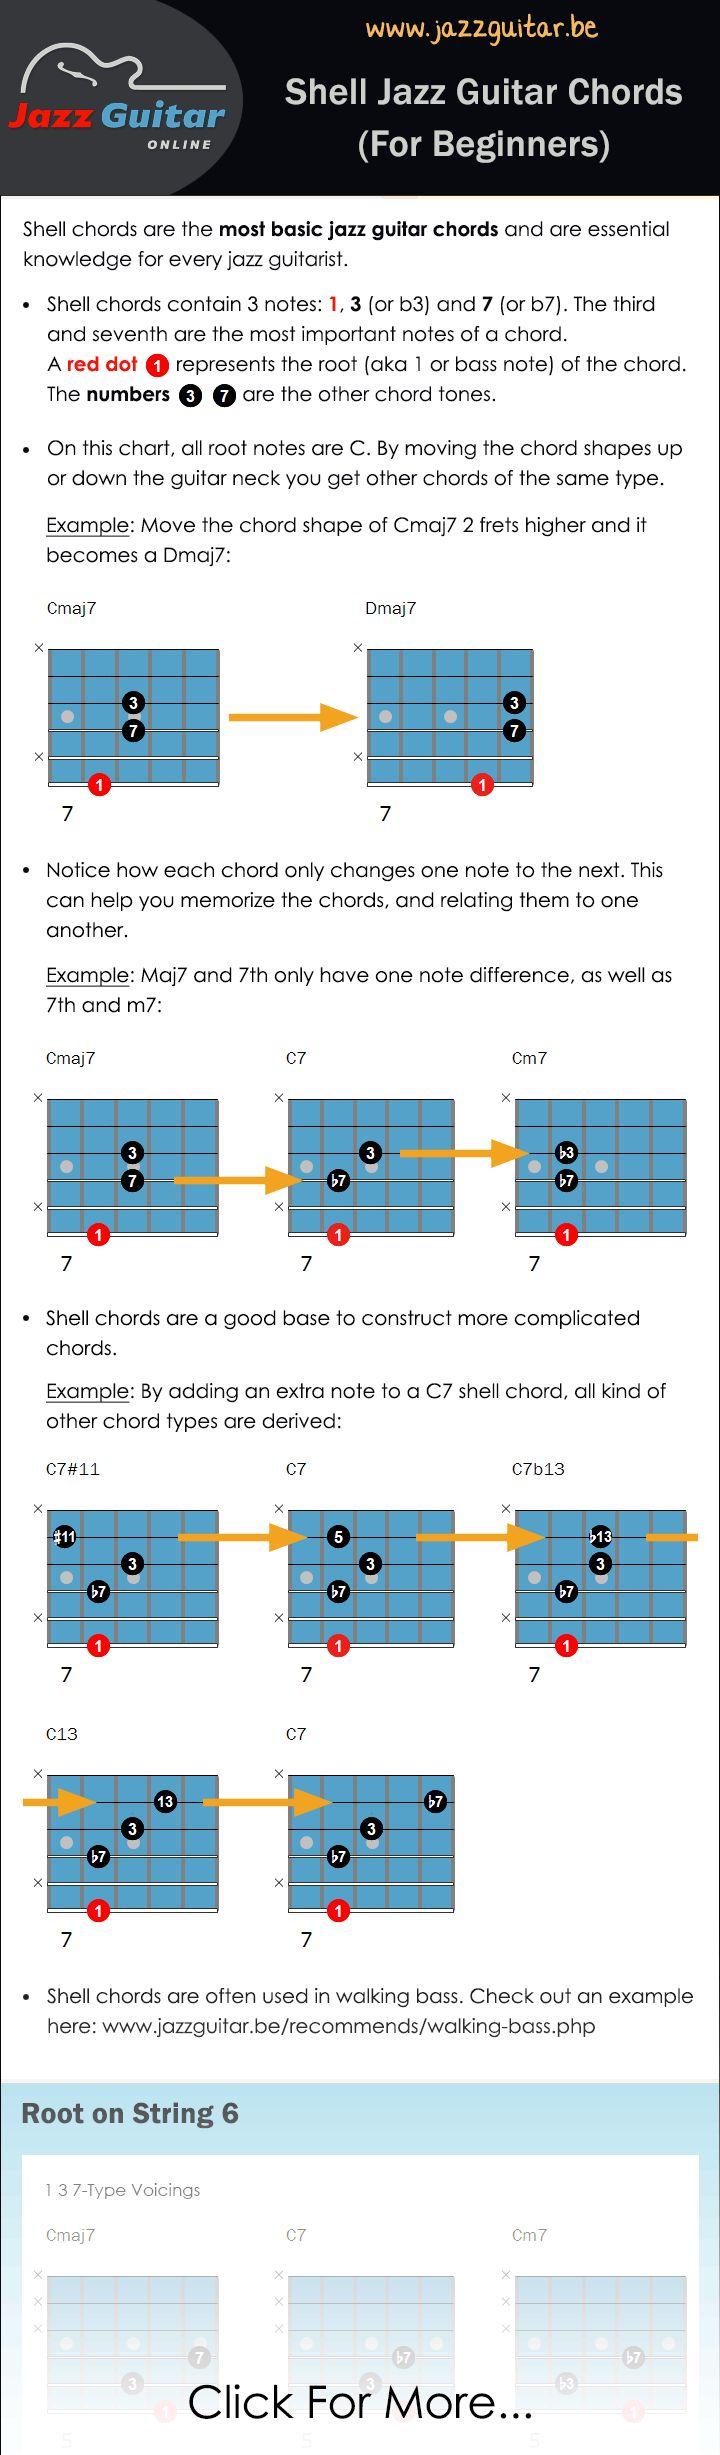 Beginner Guitar Lessons: Guitar Fundamentals Level 1